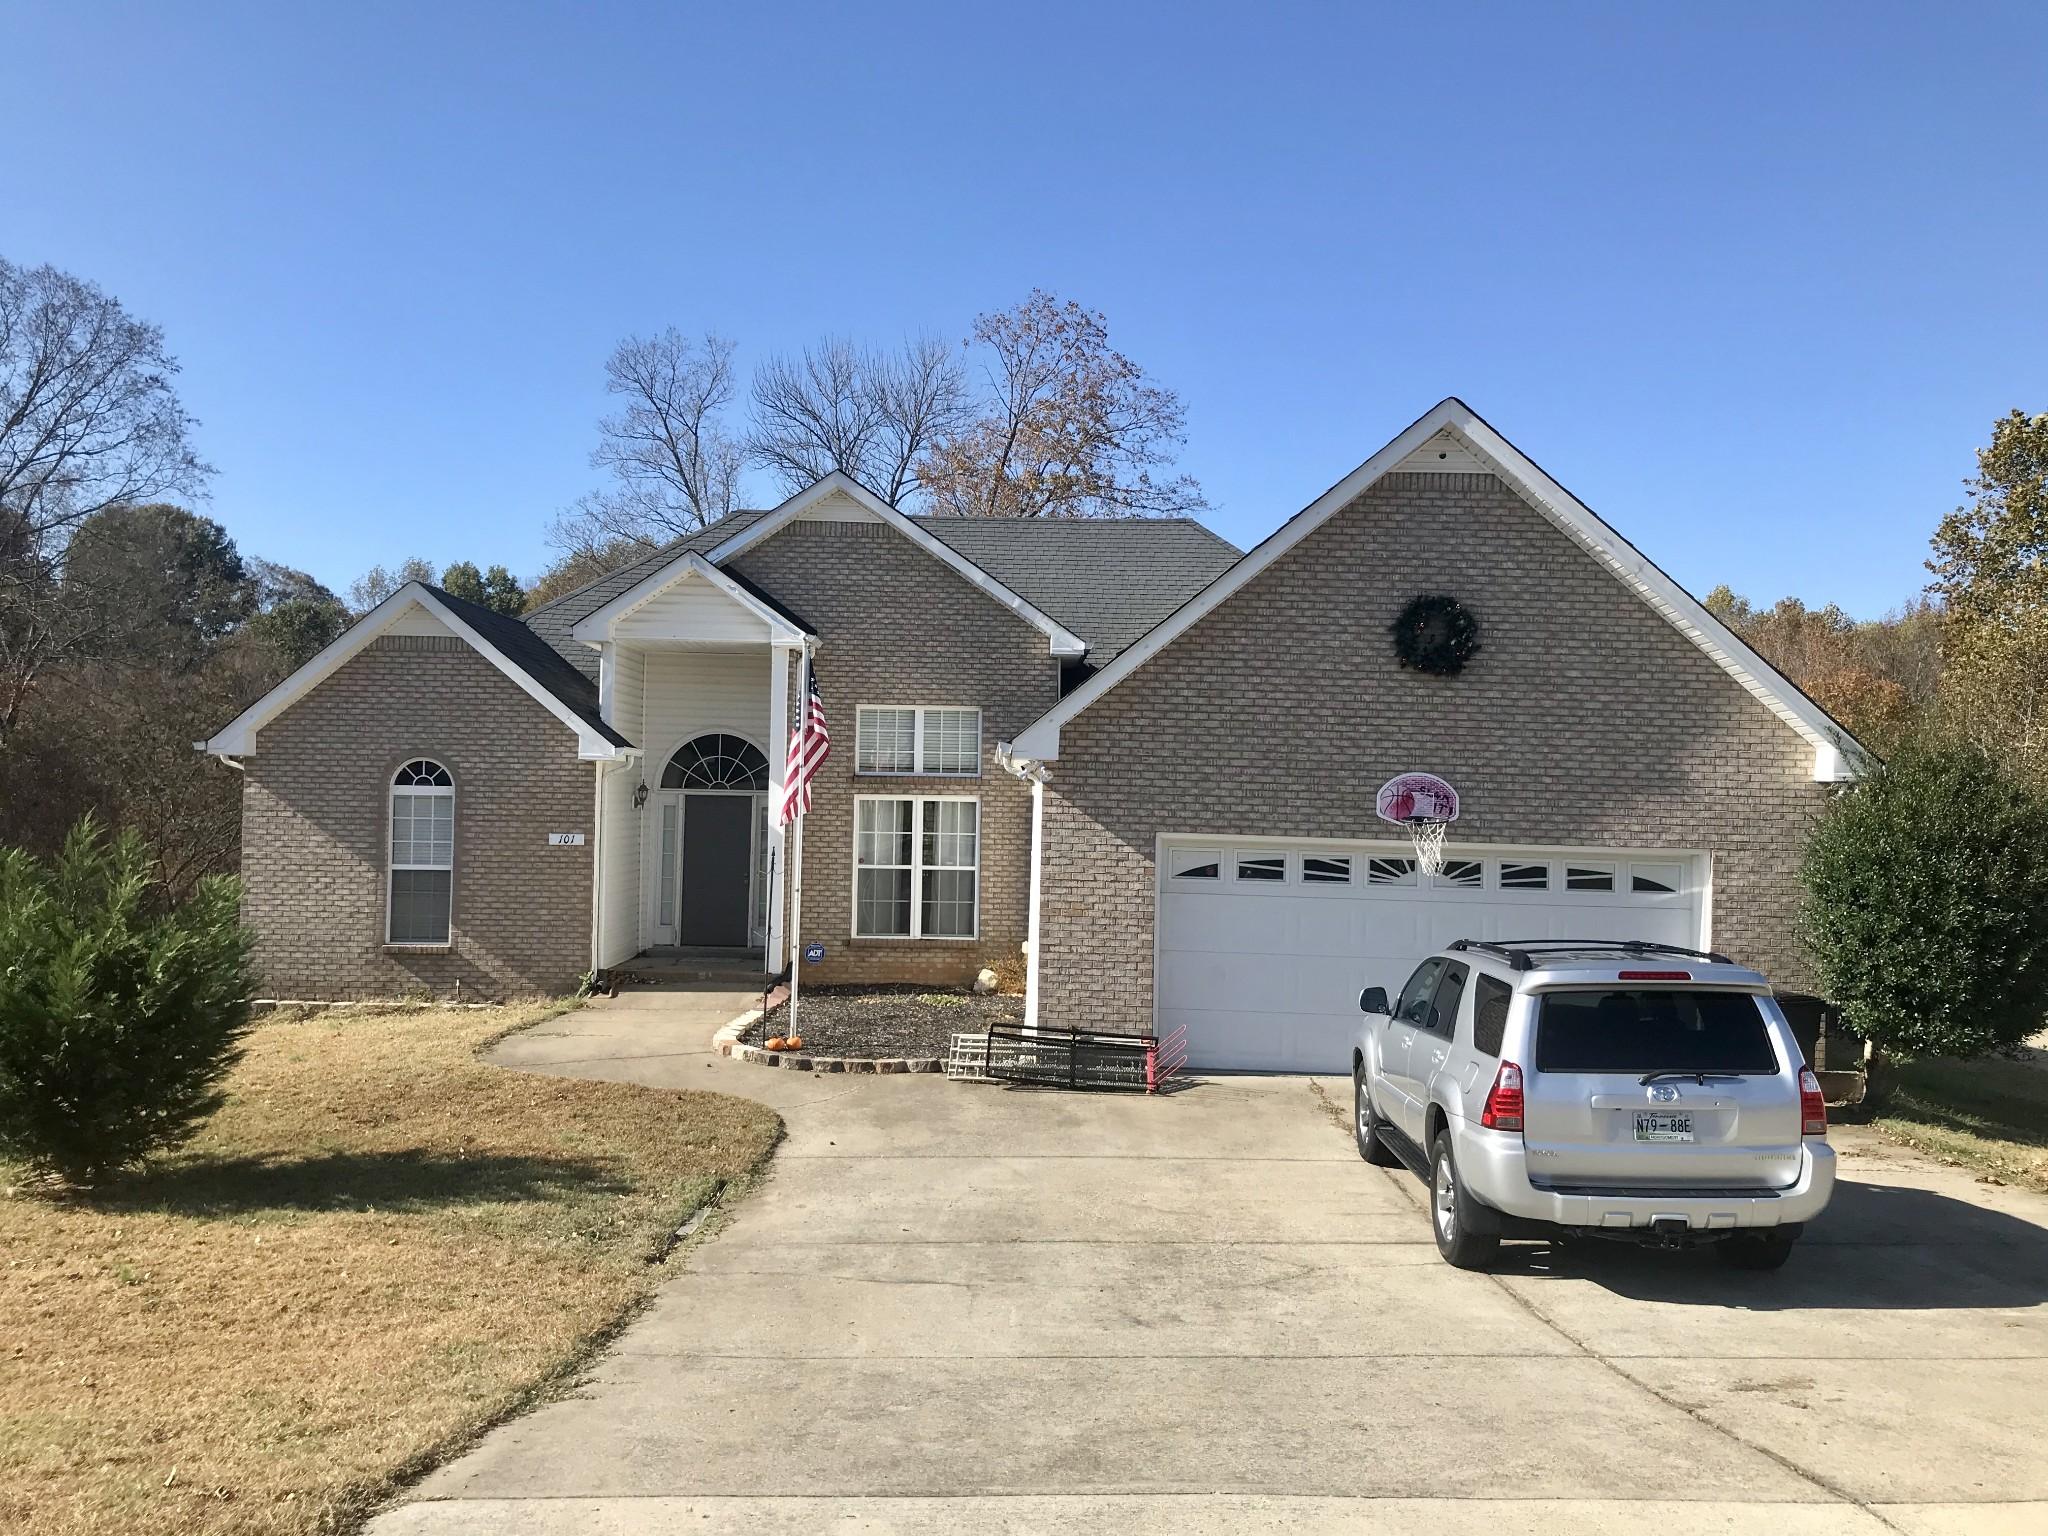 101 West Dr, Clarksville, TN 37040 - Clarksville, TN real estate listing